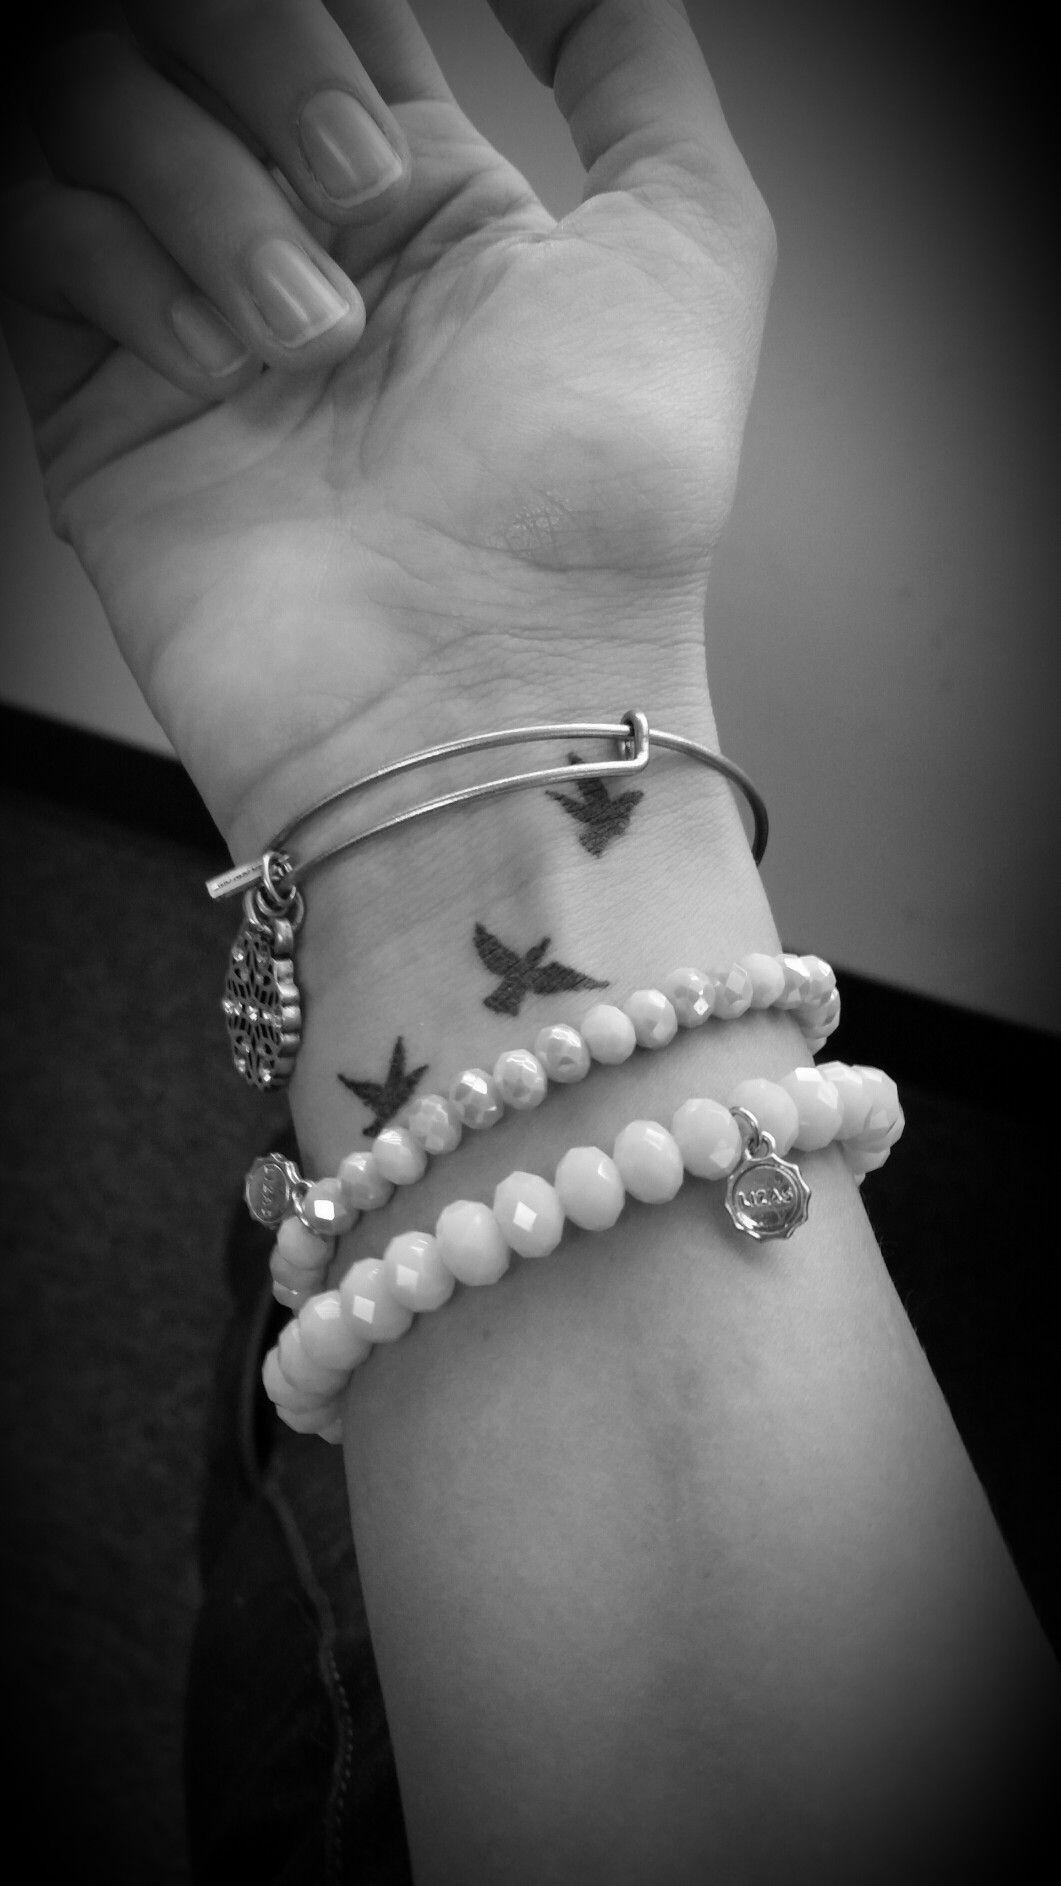 It S All For The Birds Birds Wrist Tattoo Better Photo Than The Last One Loving It Wrist Tattoo Wrist Tattoo Cover Up